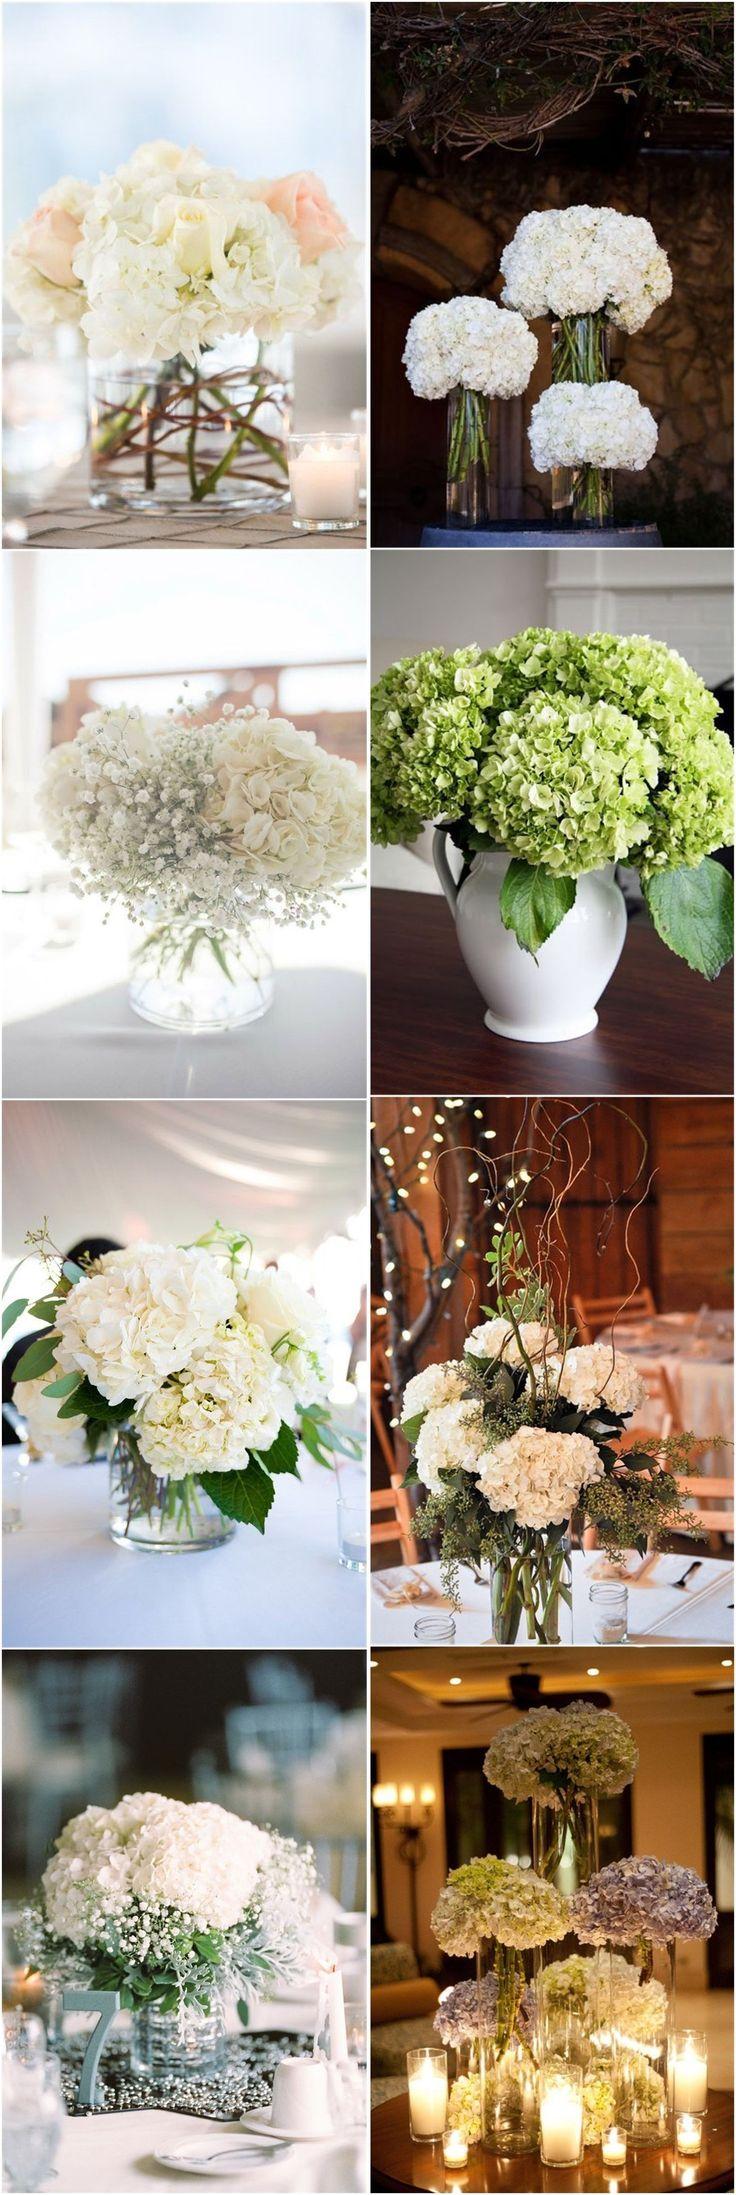 Best hydrangea wedding centerpieces ideas on pinterest